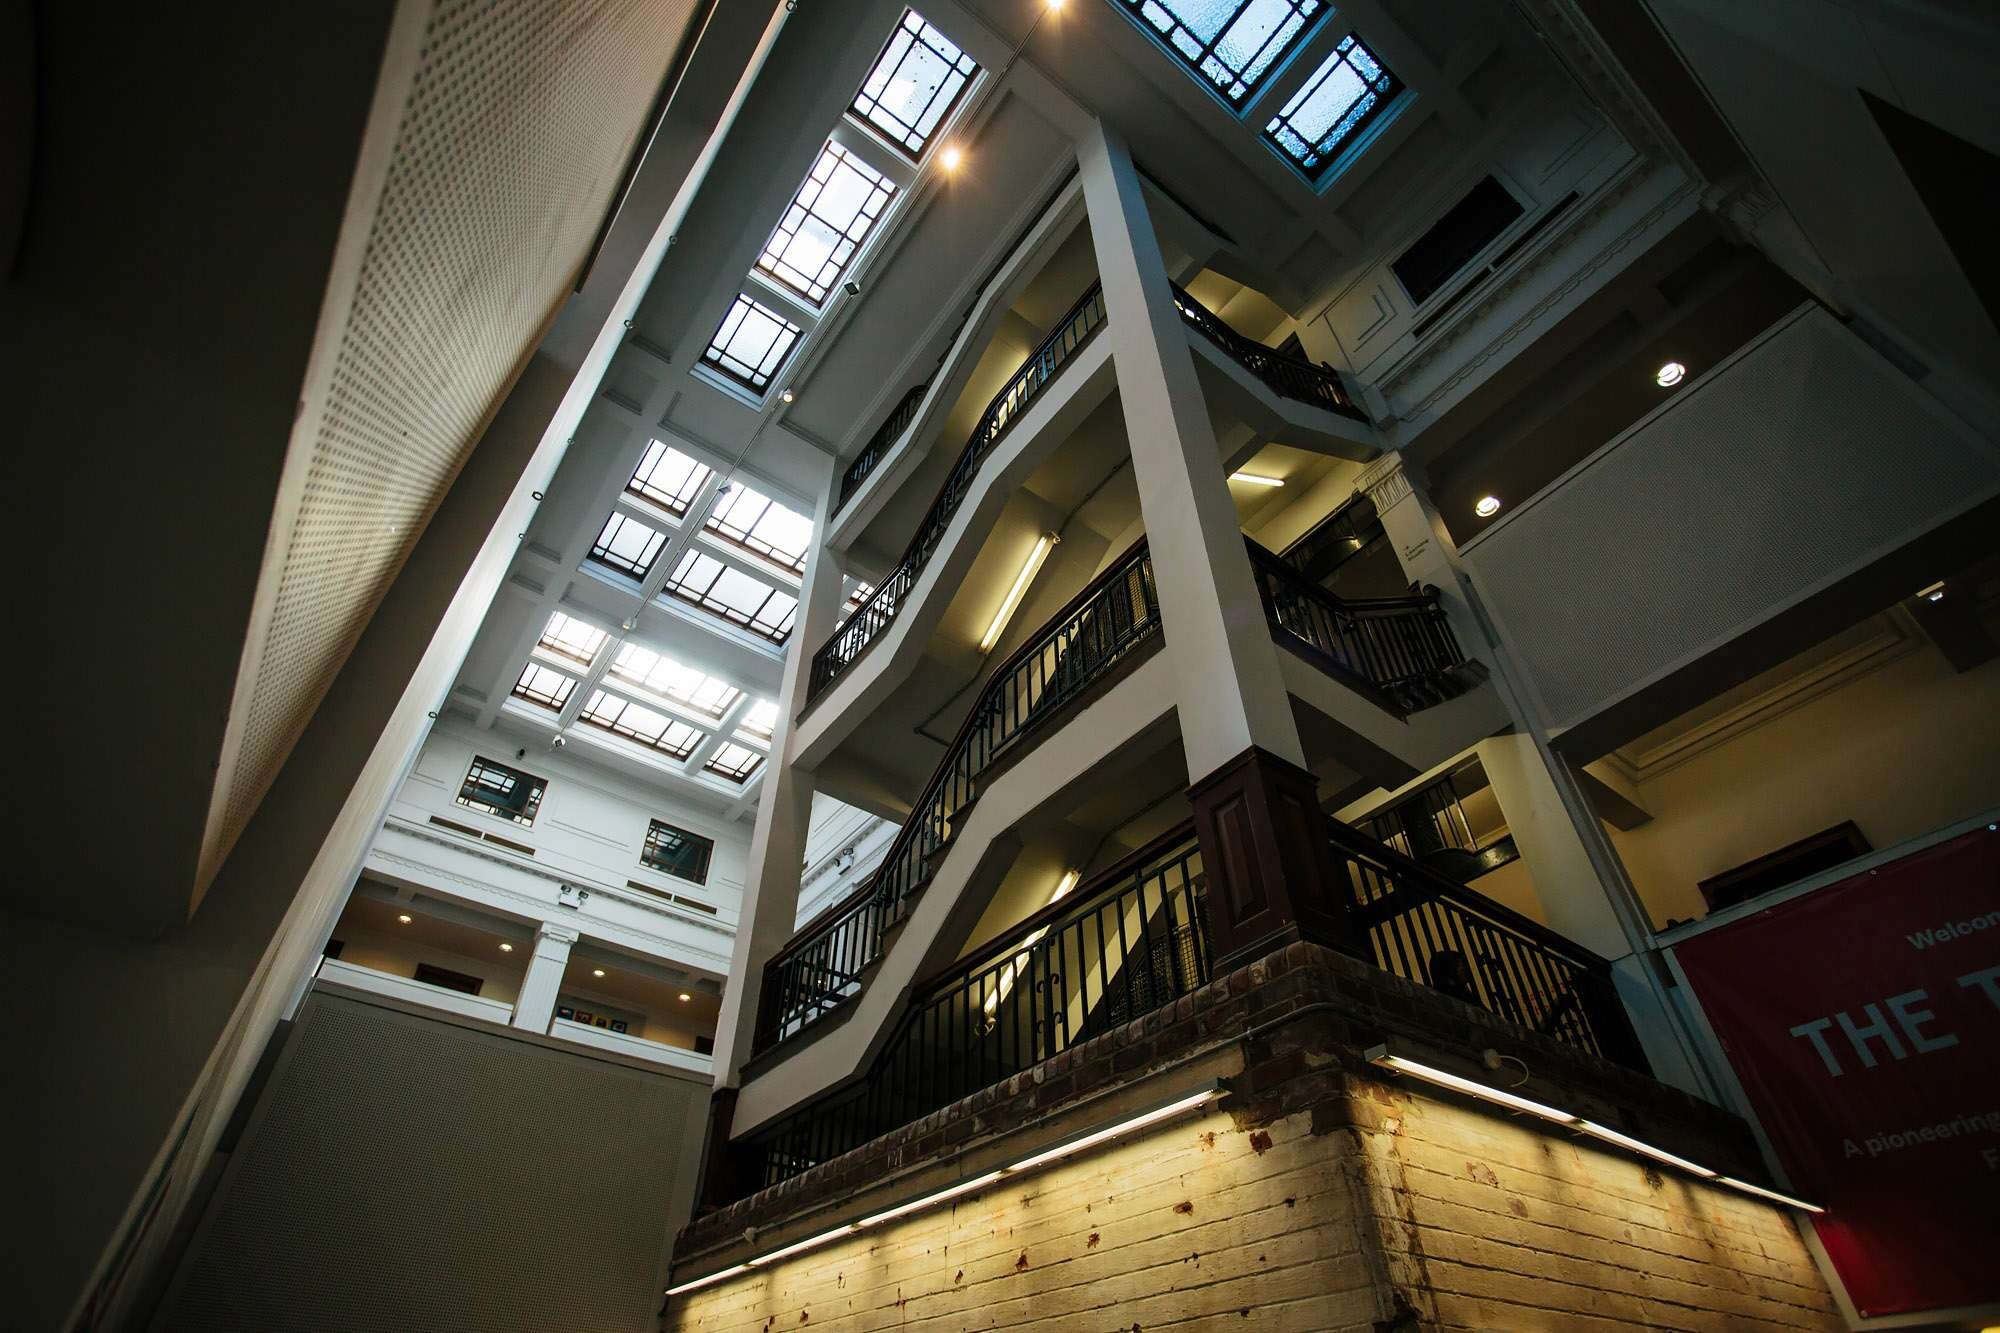 Interior staircase at The Tetley Leeds